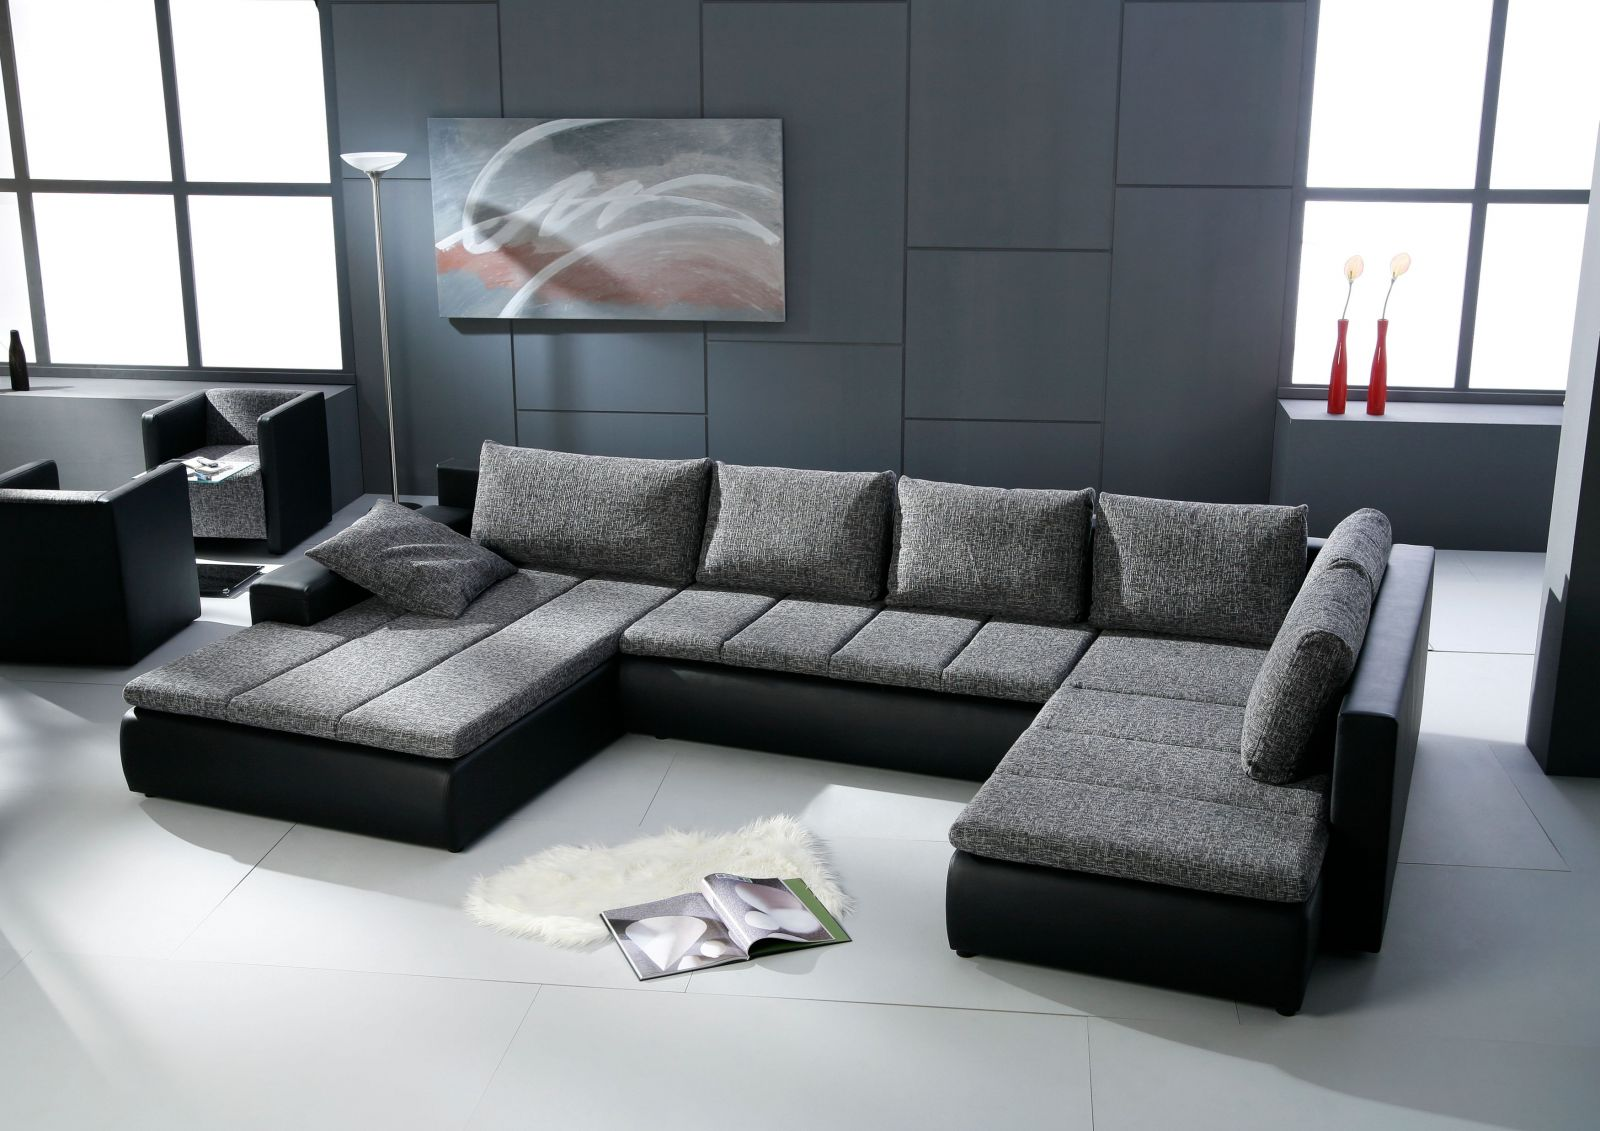 Sofas u form cheap edle design uform mega big sofa ucouch for Sofa u form federkern